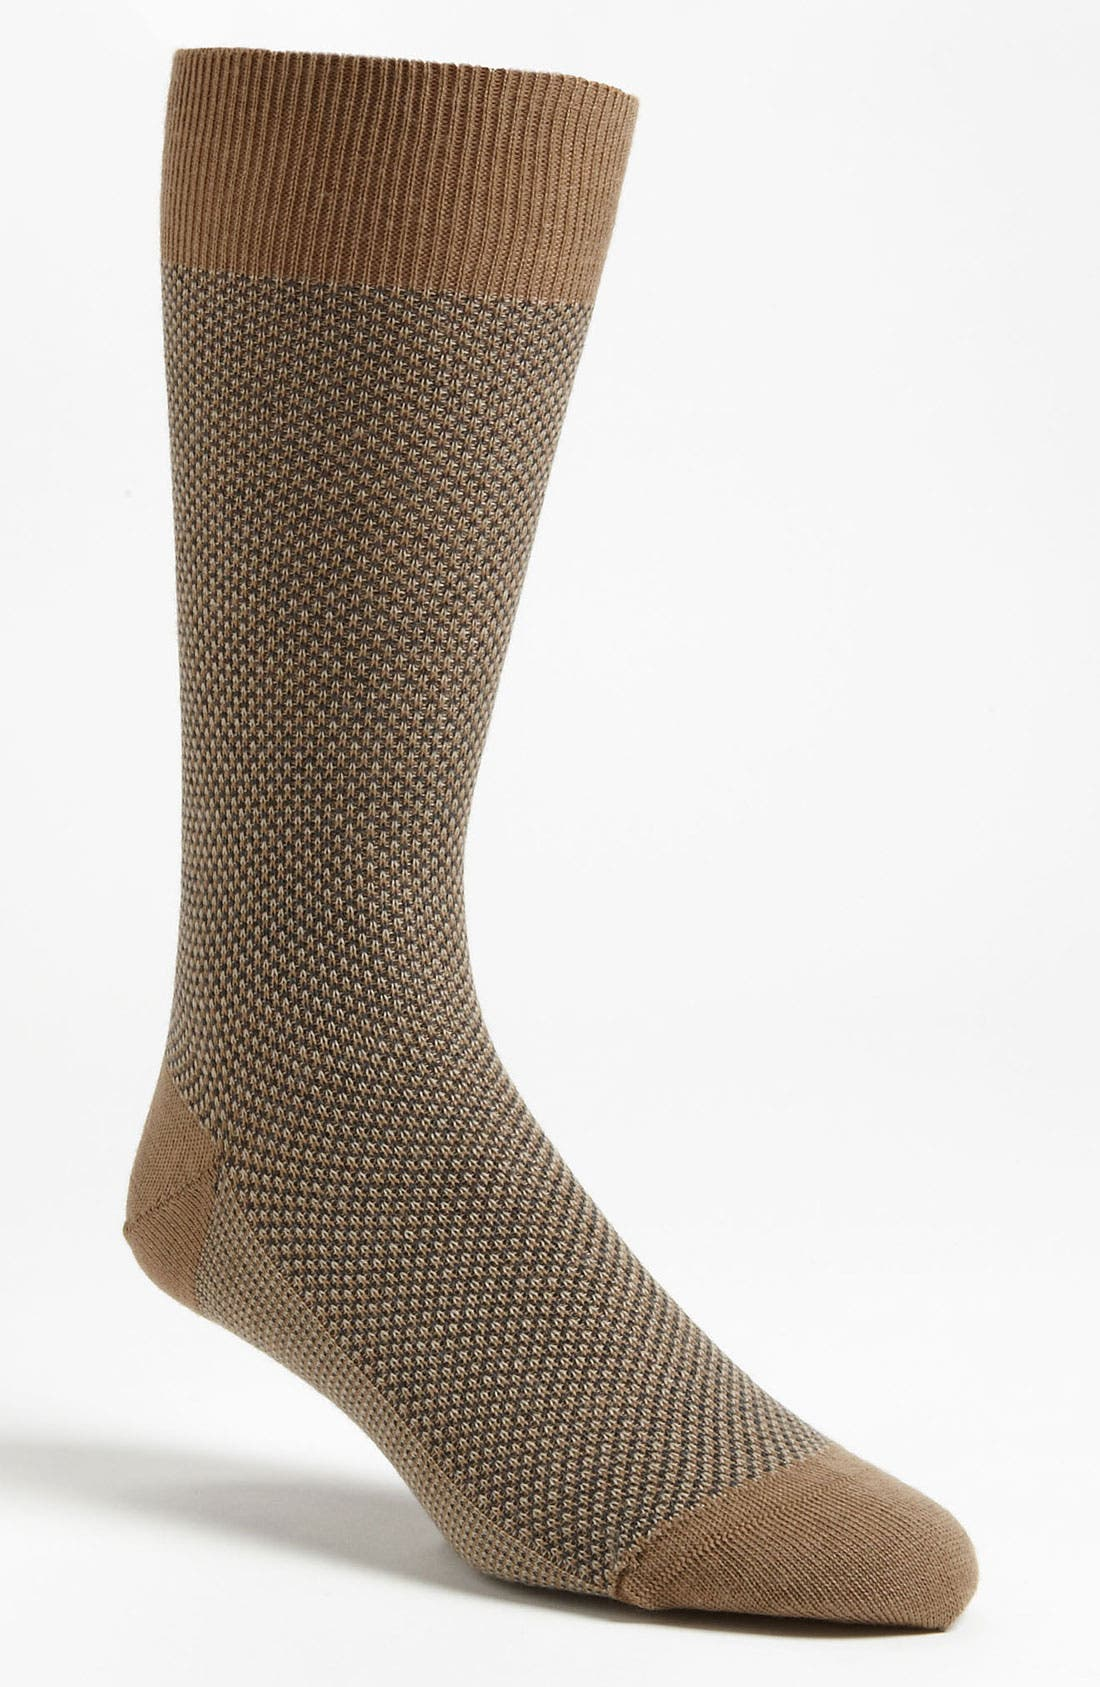 Main Image - Pantherella 'Vintage Collection' Birdseye Socks